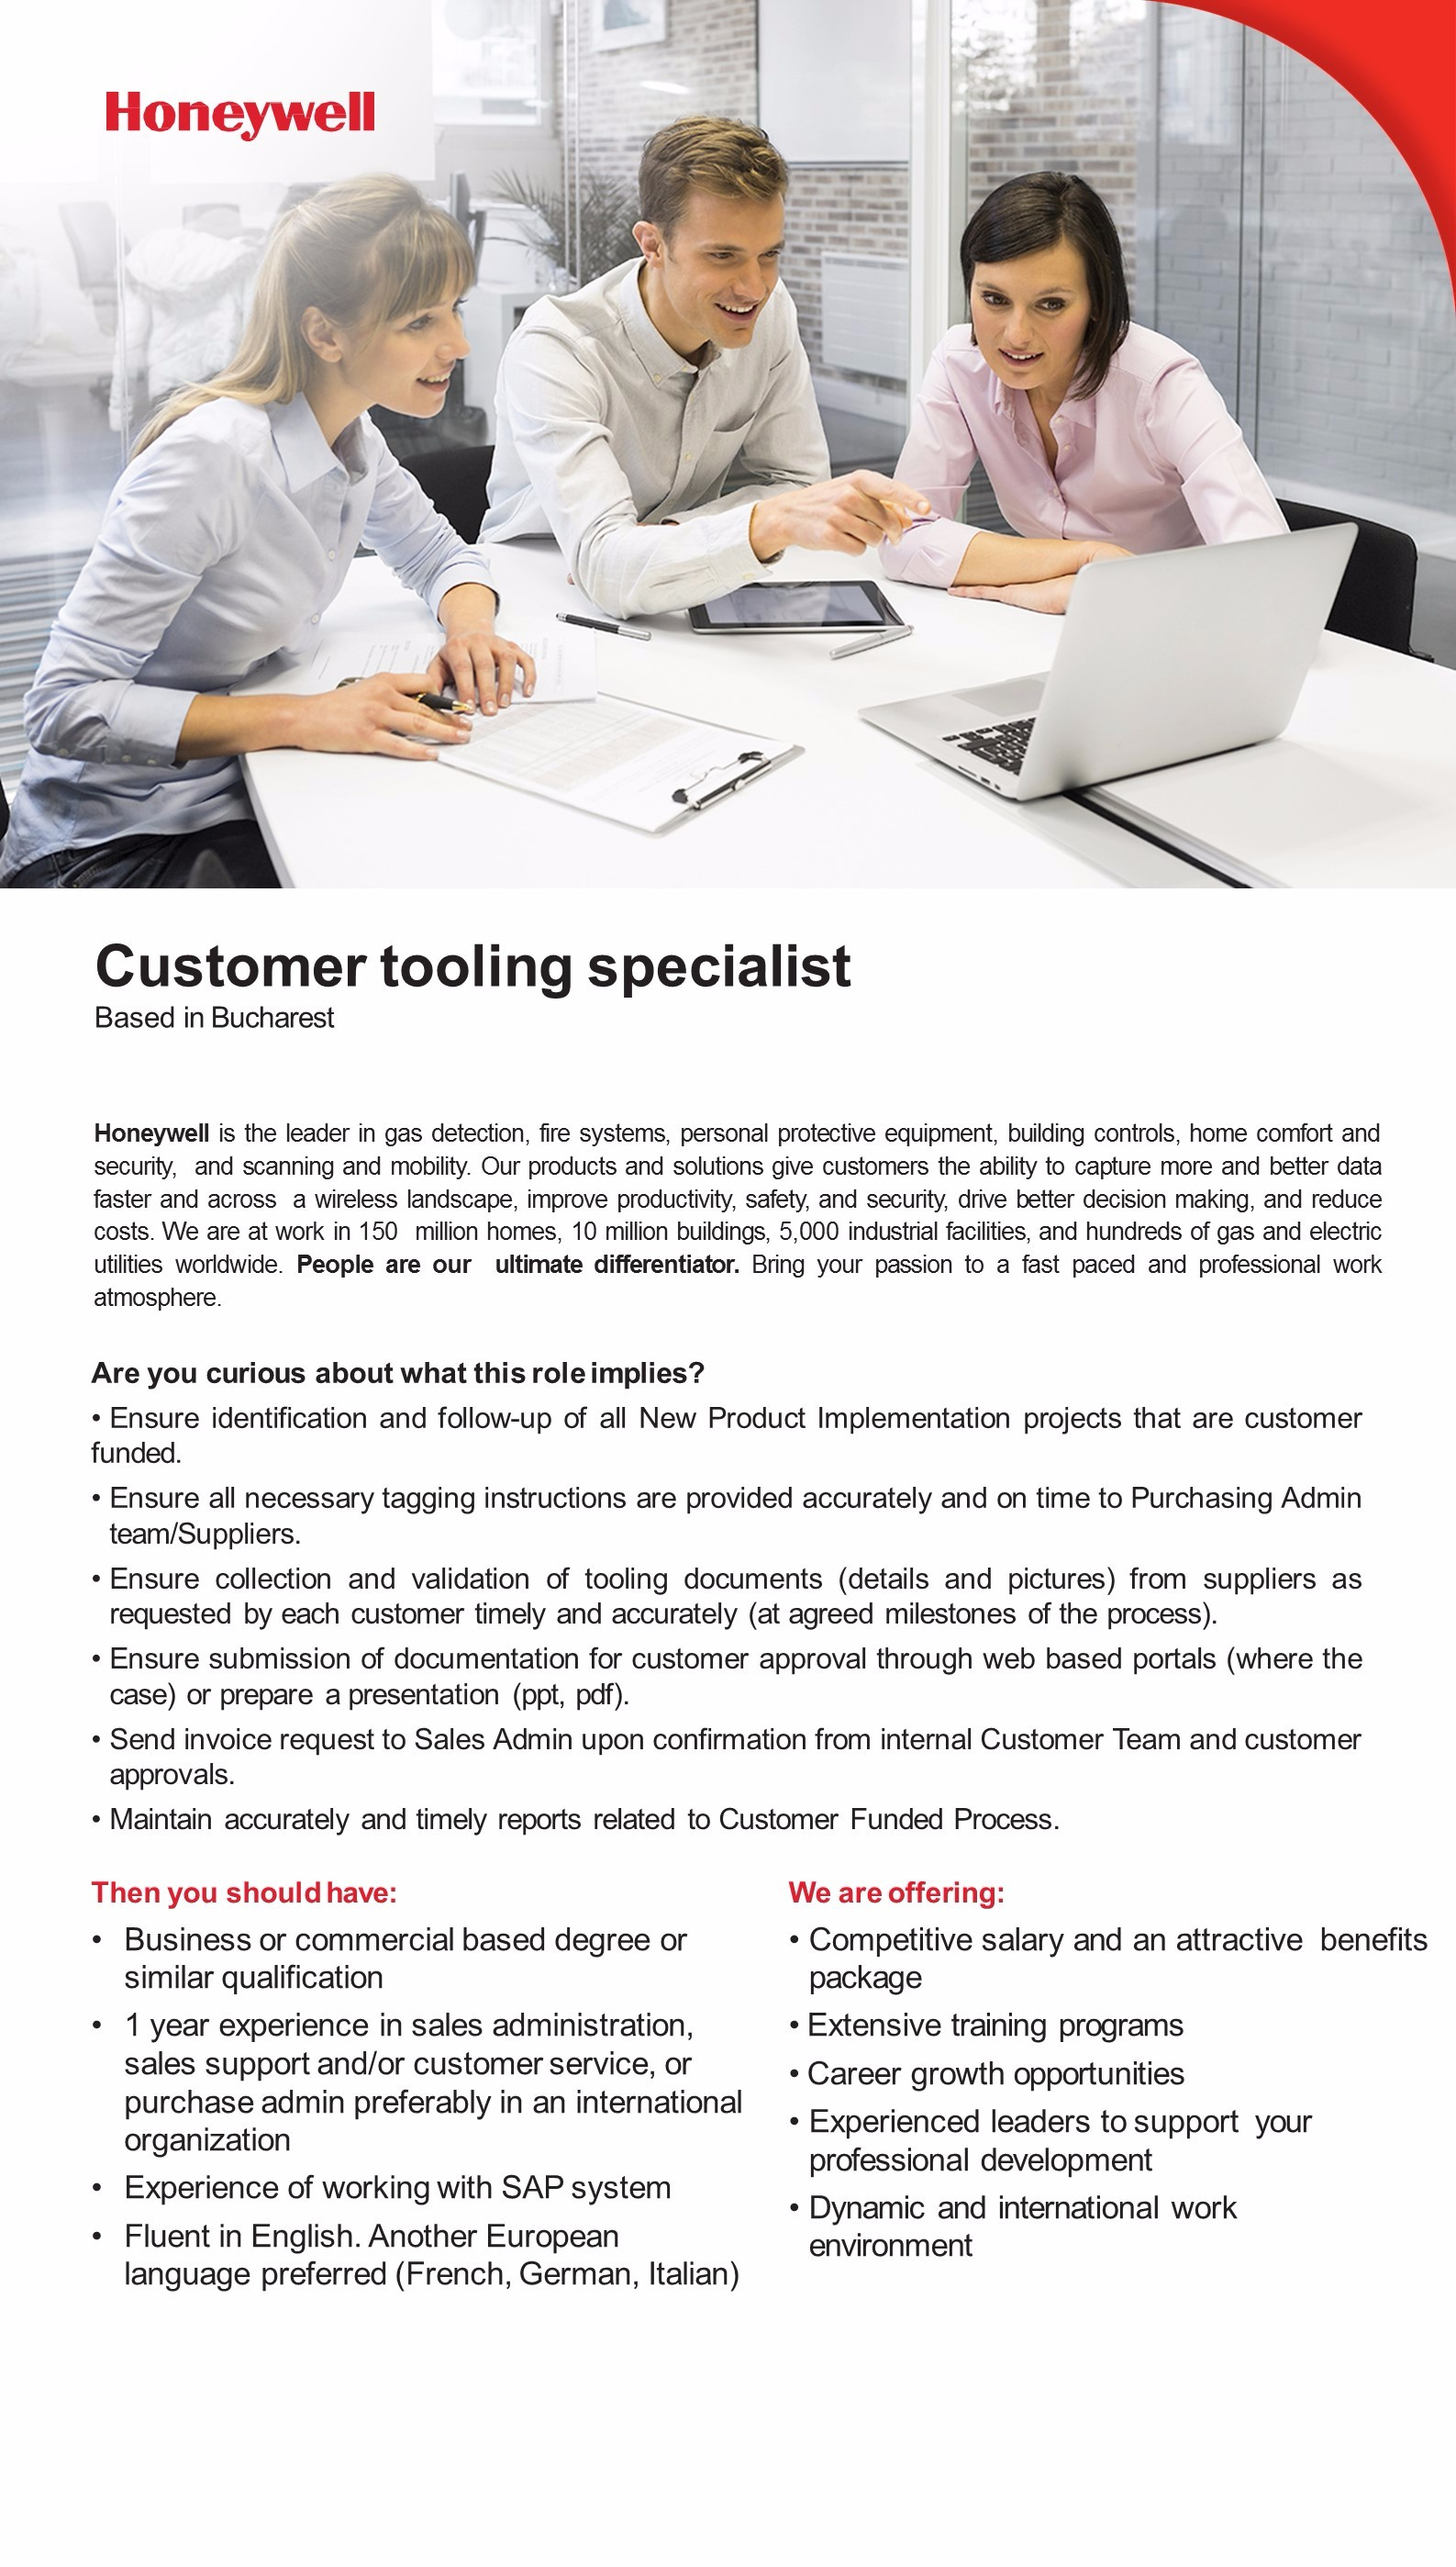 Customer tooling